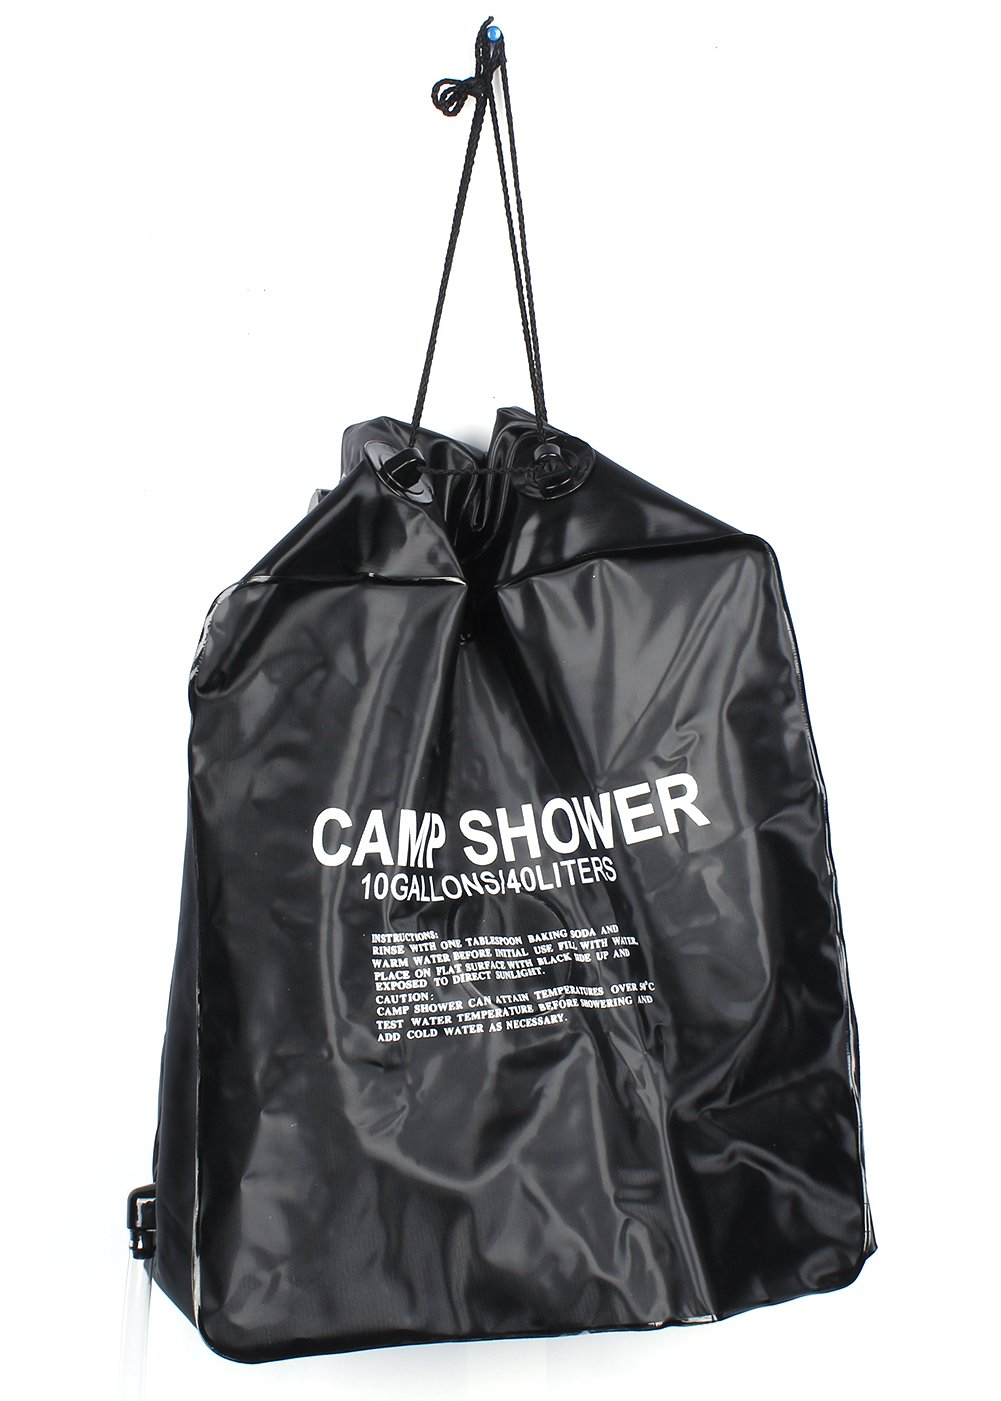 Candora 40L/10 gallon Camping bolsa de ducha calefacción solar senderismo campamento al aire libre climatizada solar portátil Pipe bolsa de agua ducha al ...